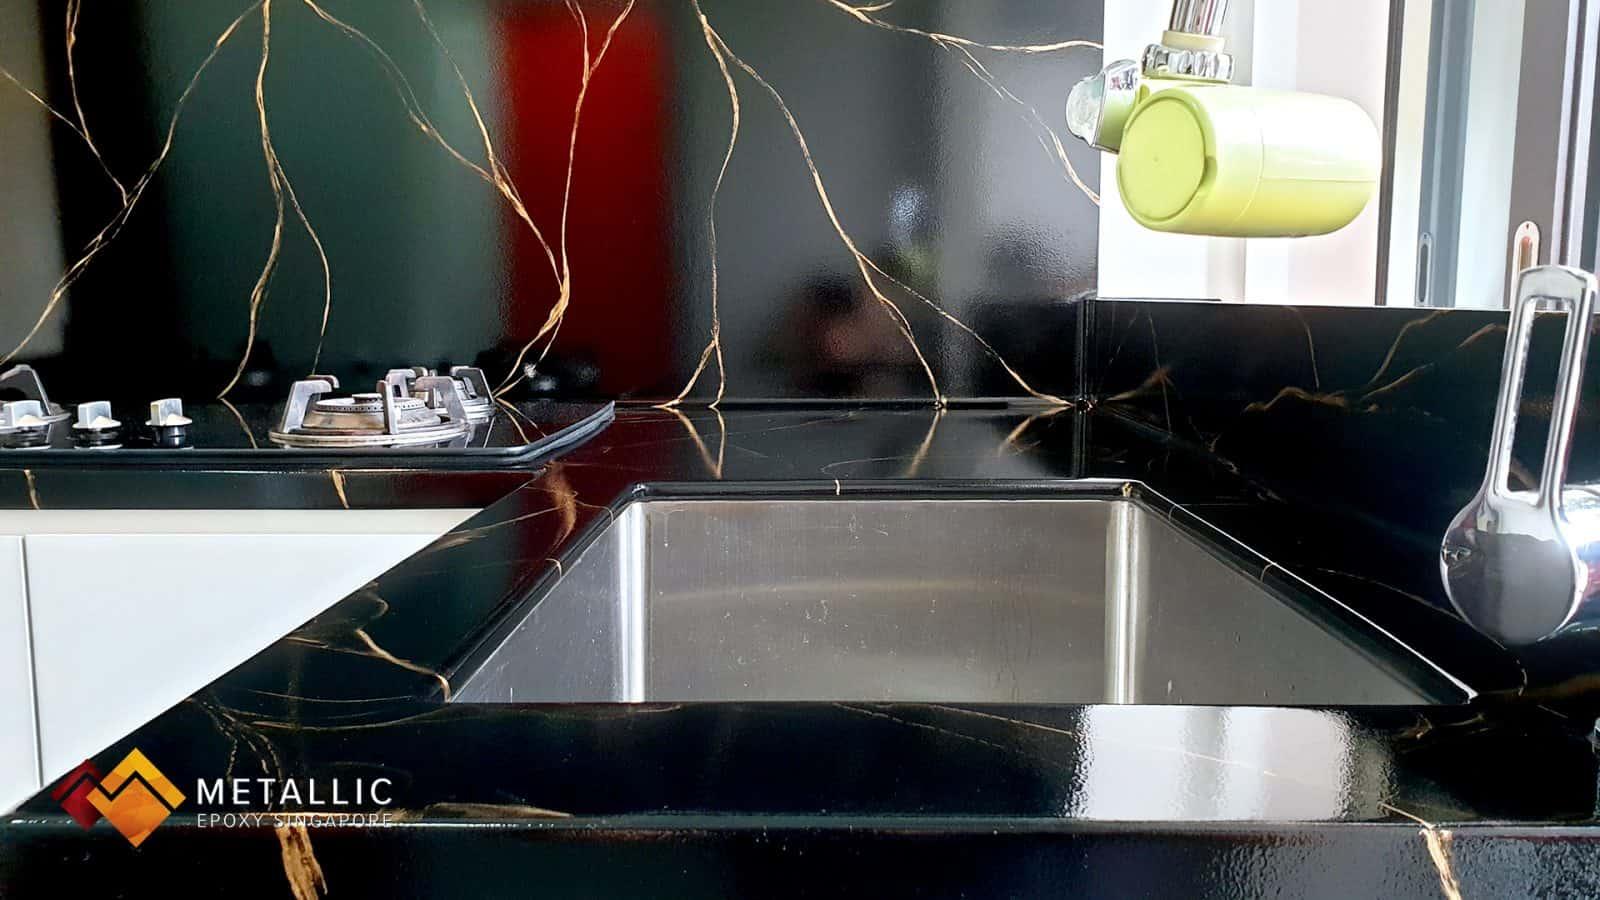 Metallic Epoxy Kitchen Countertop Gold Veins Black Marble